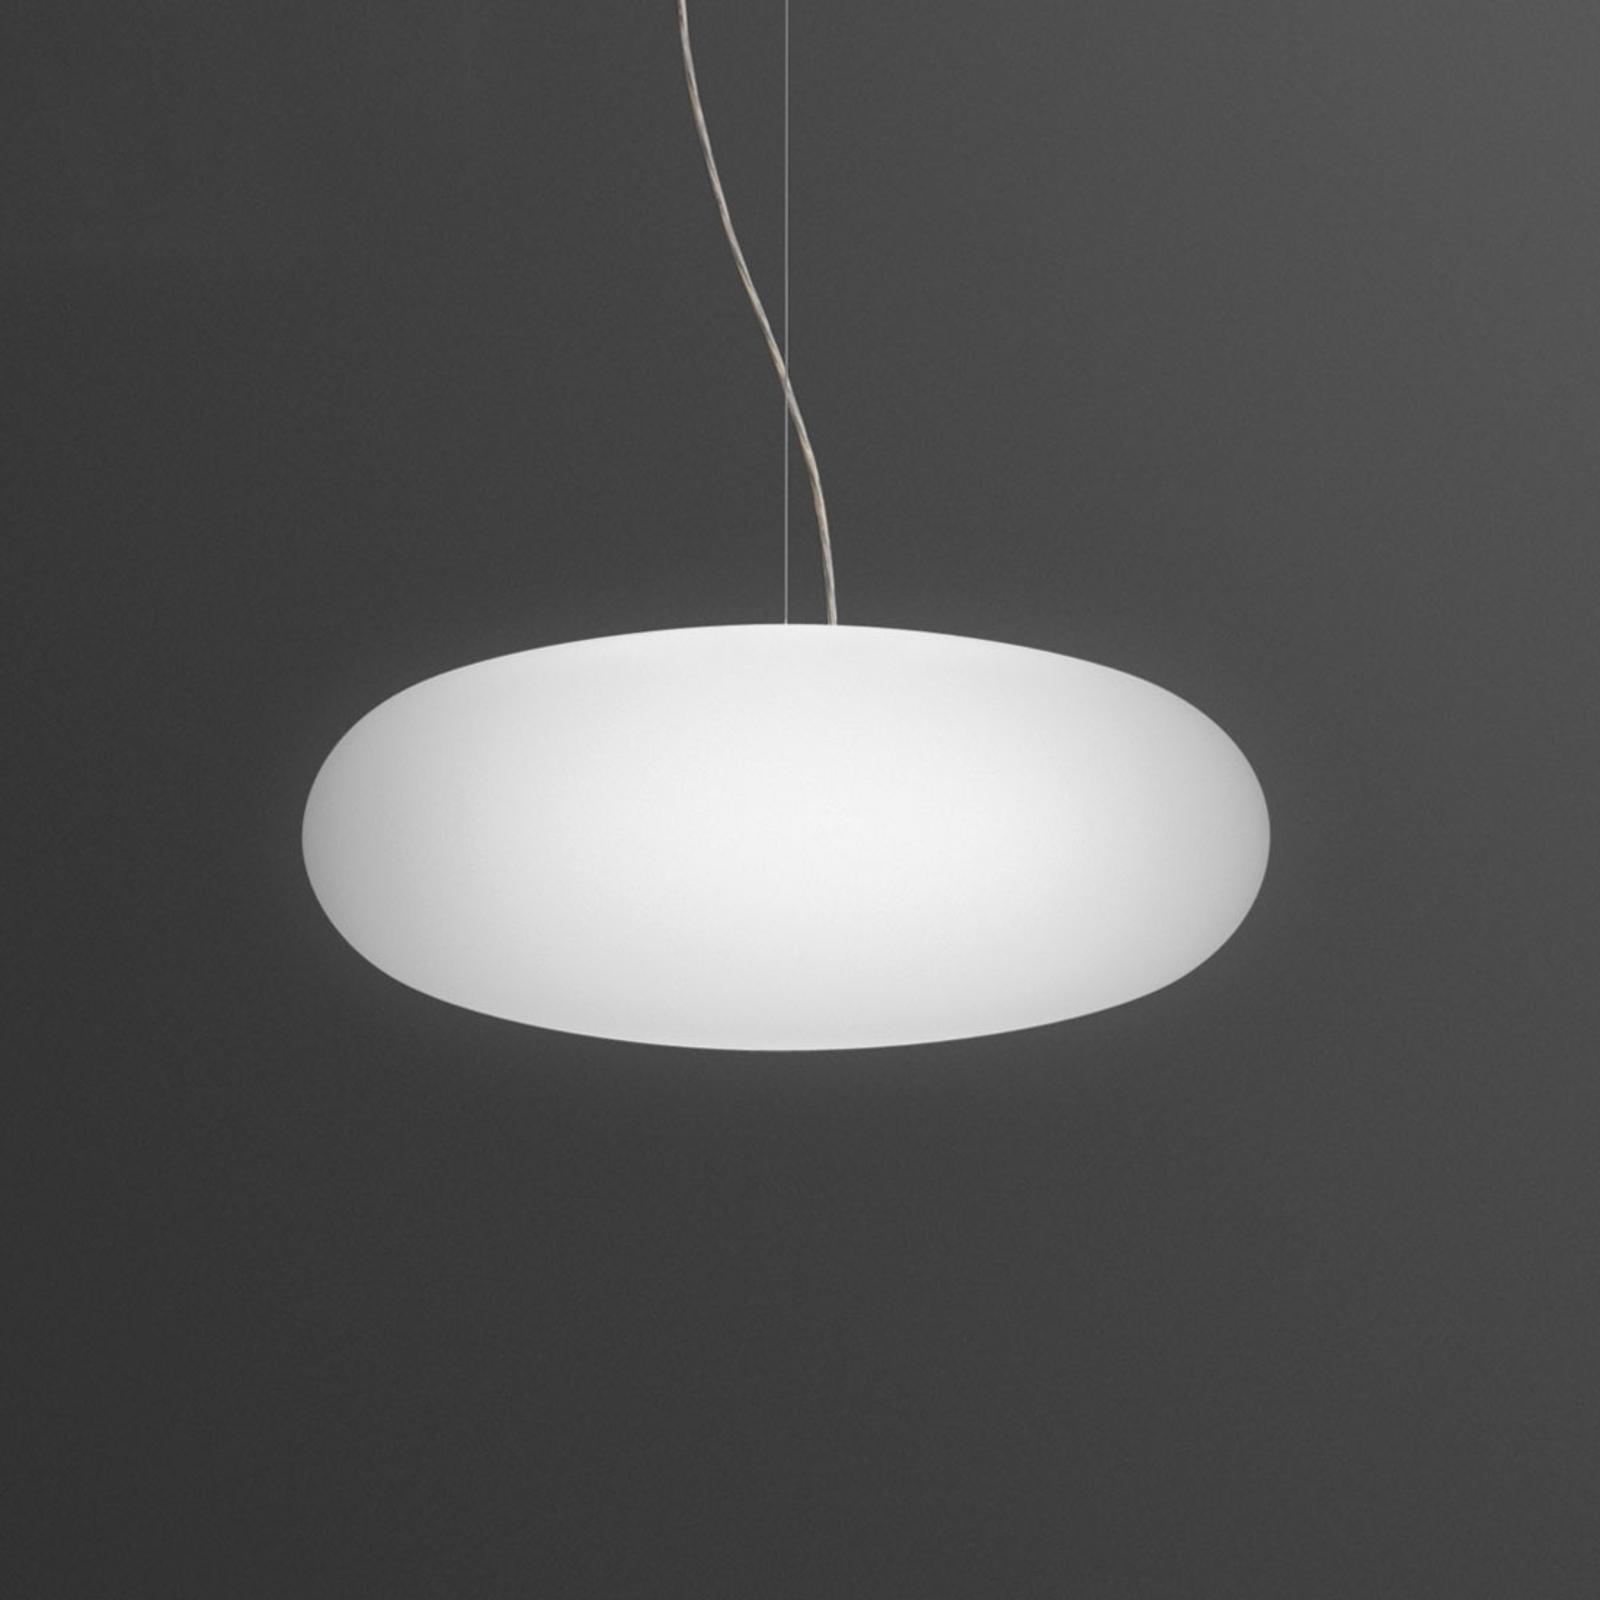 Vibia Vol 0220 lampa wisząca ze szkła, Ø 45 cm